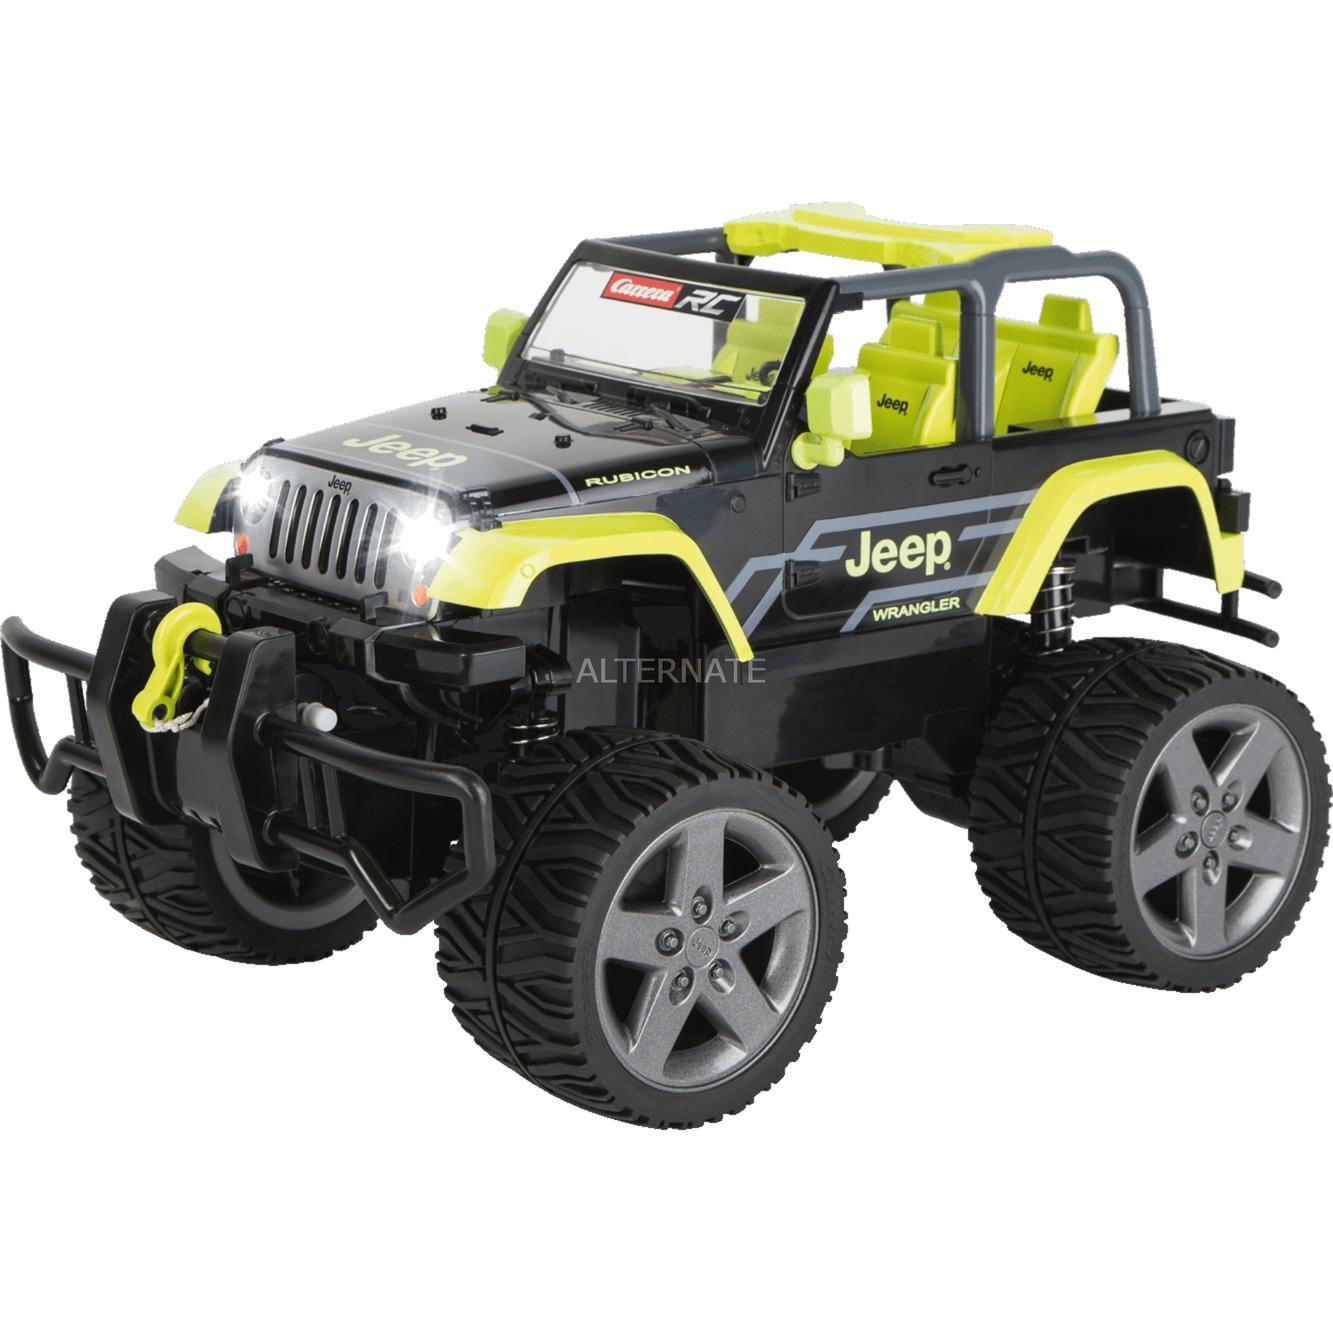 Rc Rubiconnoirvert Jeep Jeep Wrangler Rubiconnoirvert Wrangler Rc Rc Jeep 80wOknPX